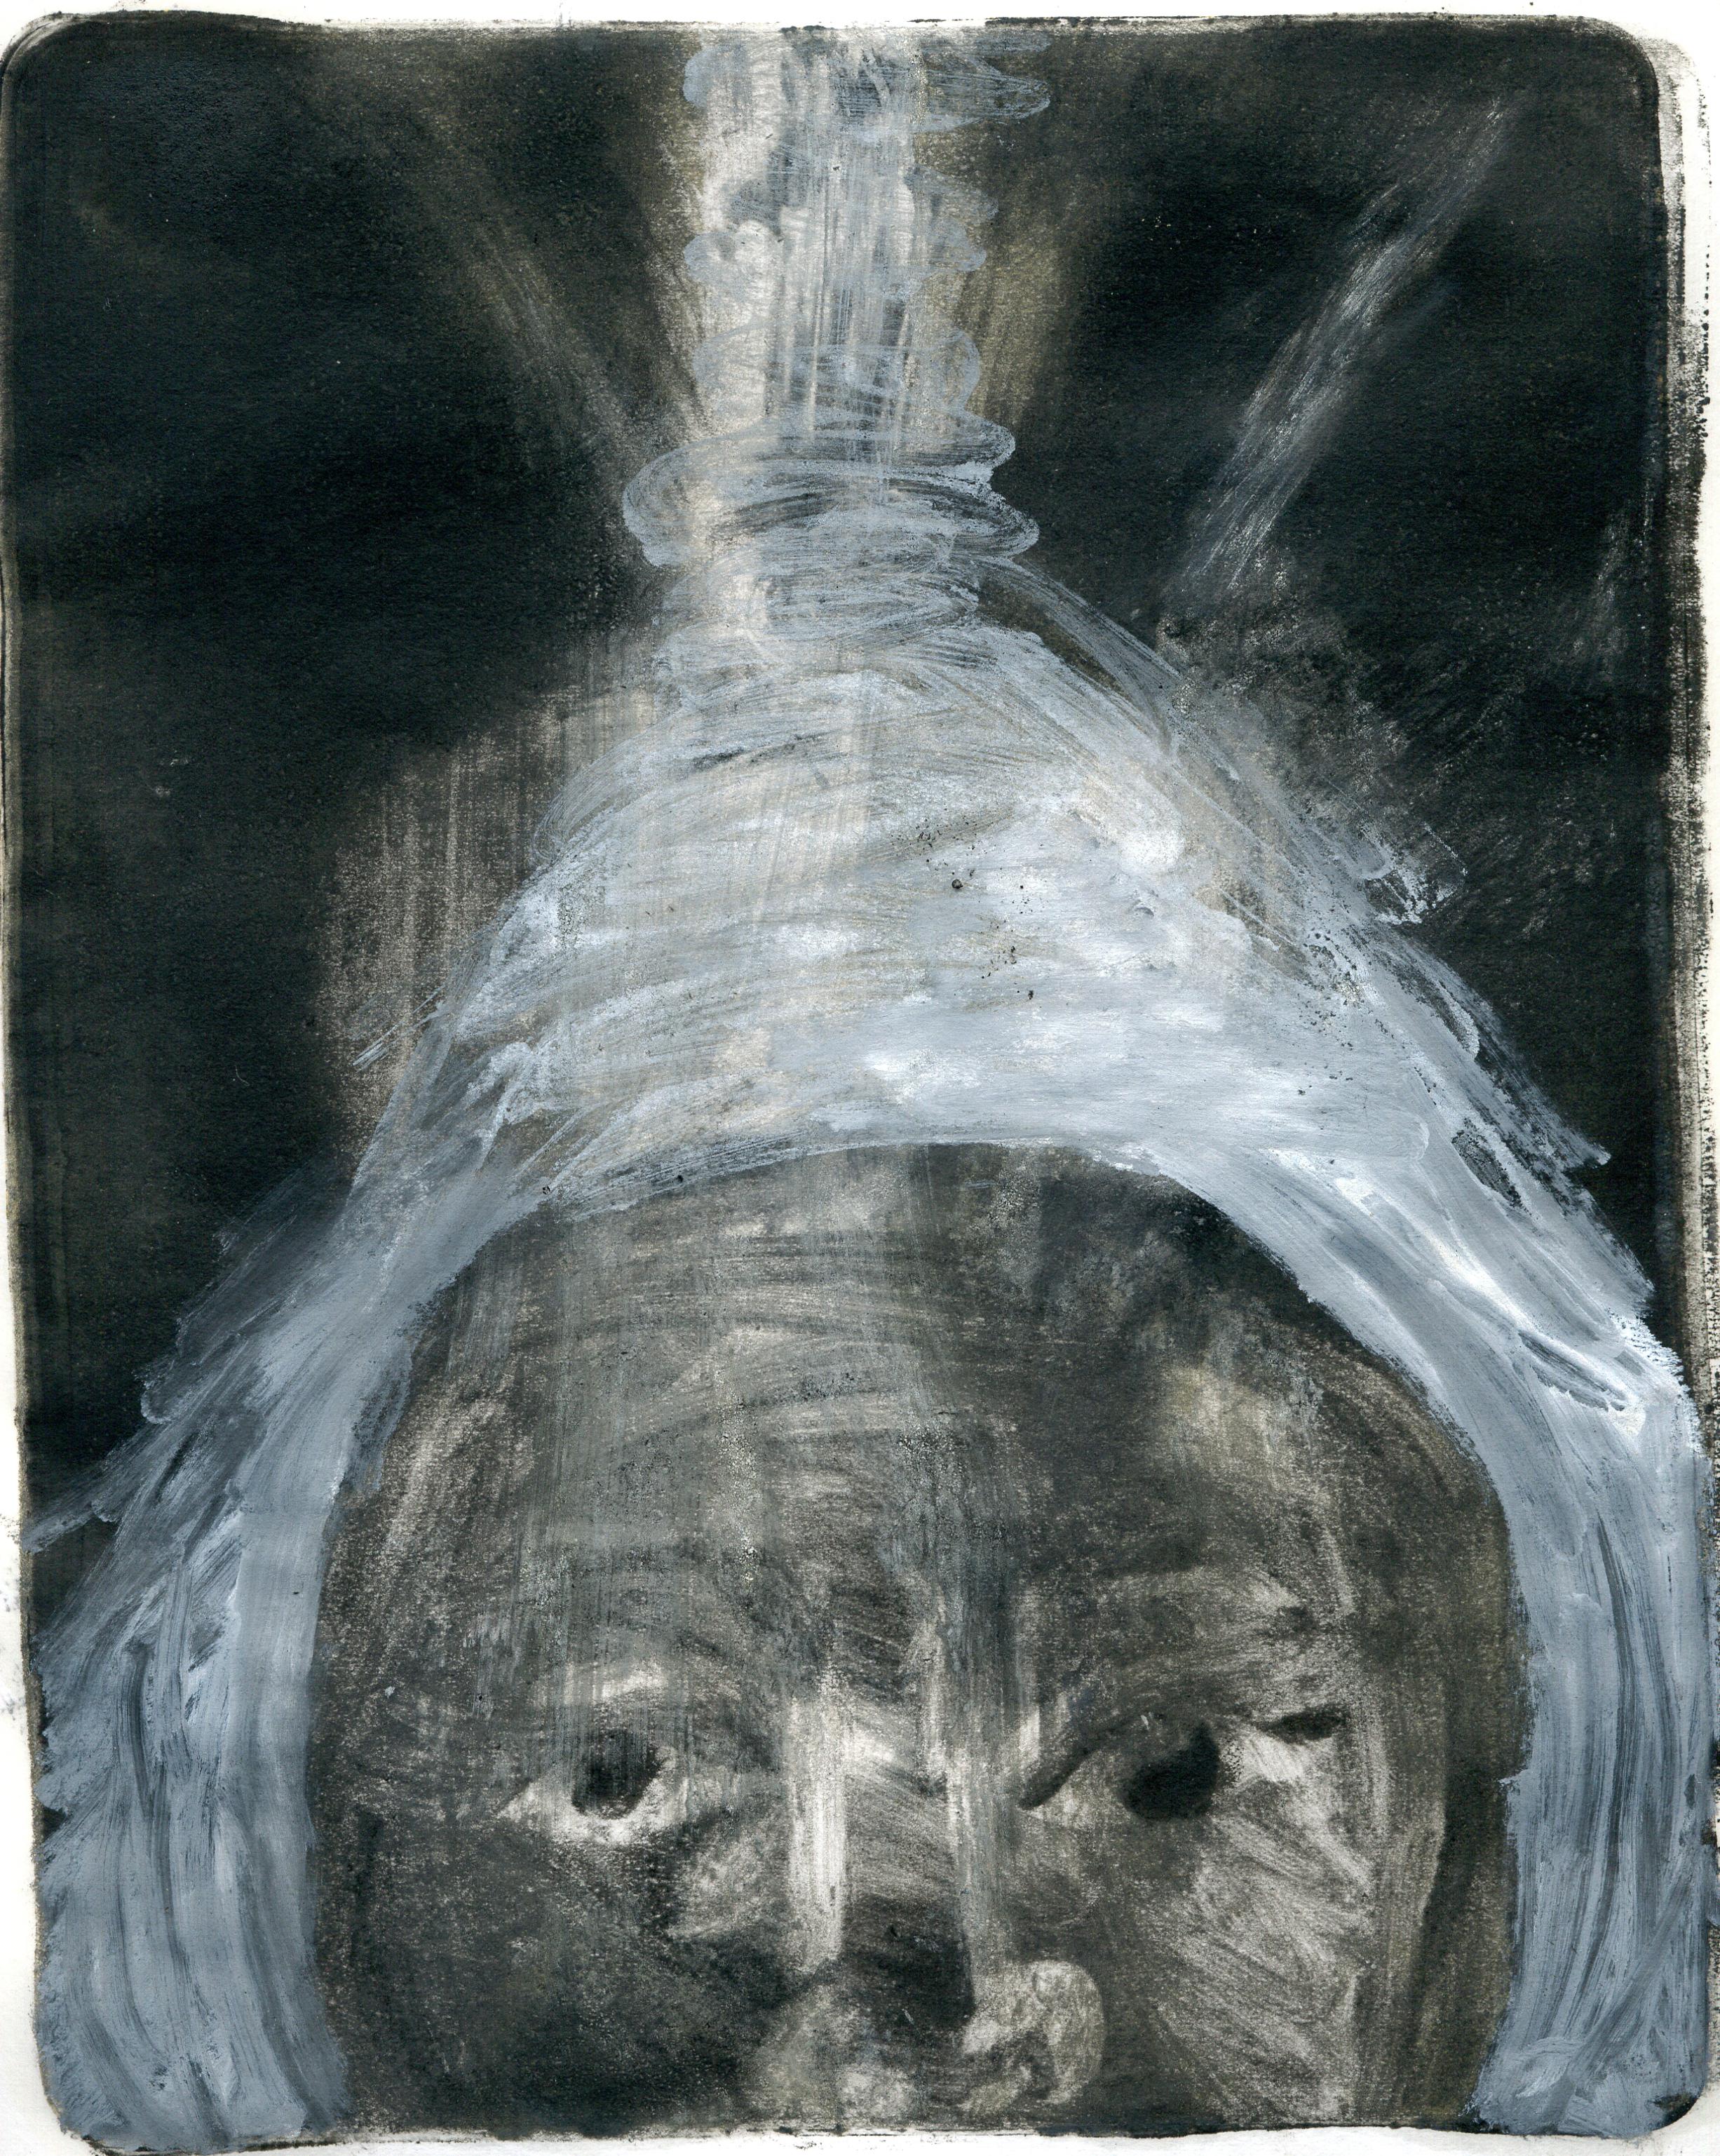 the artist cogitates